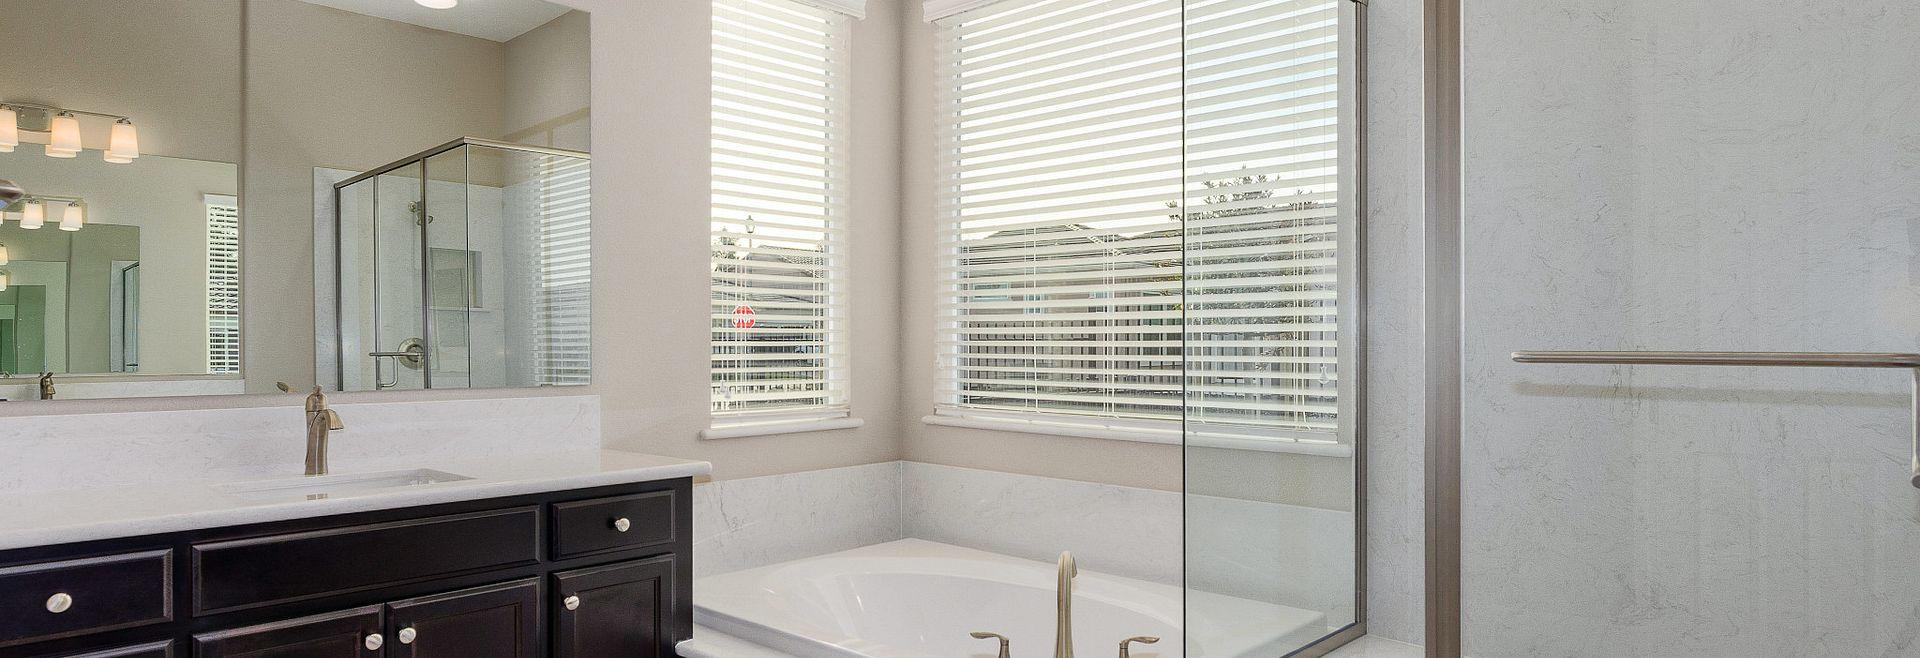 Homesite 3050 Master Bathroom